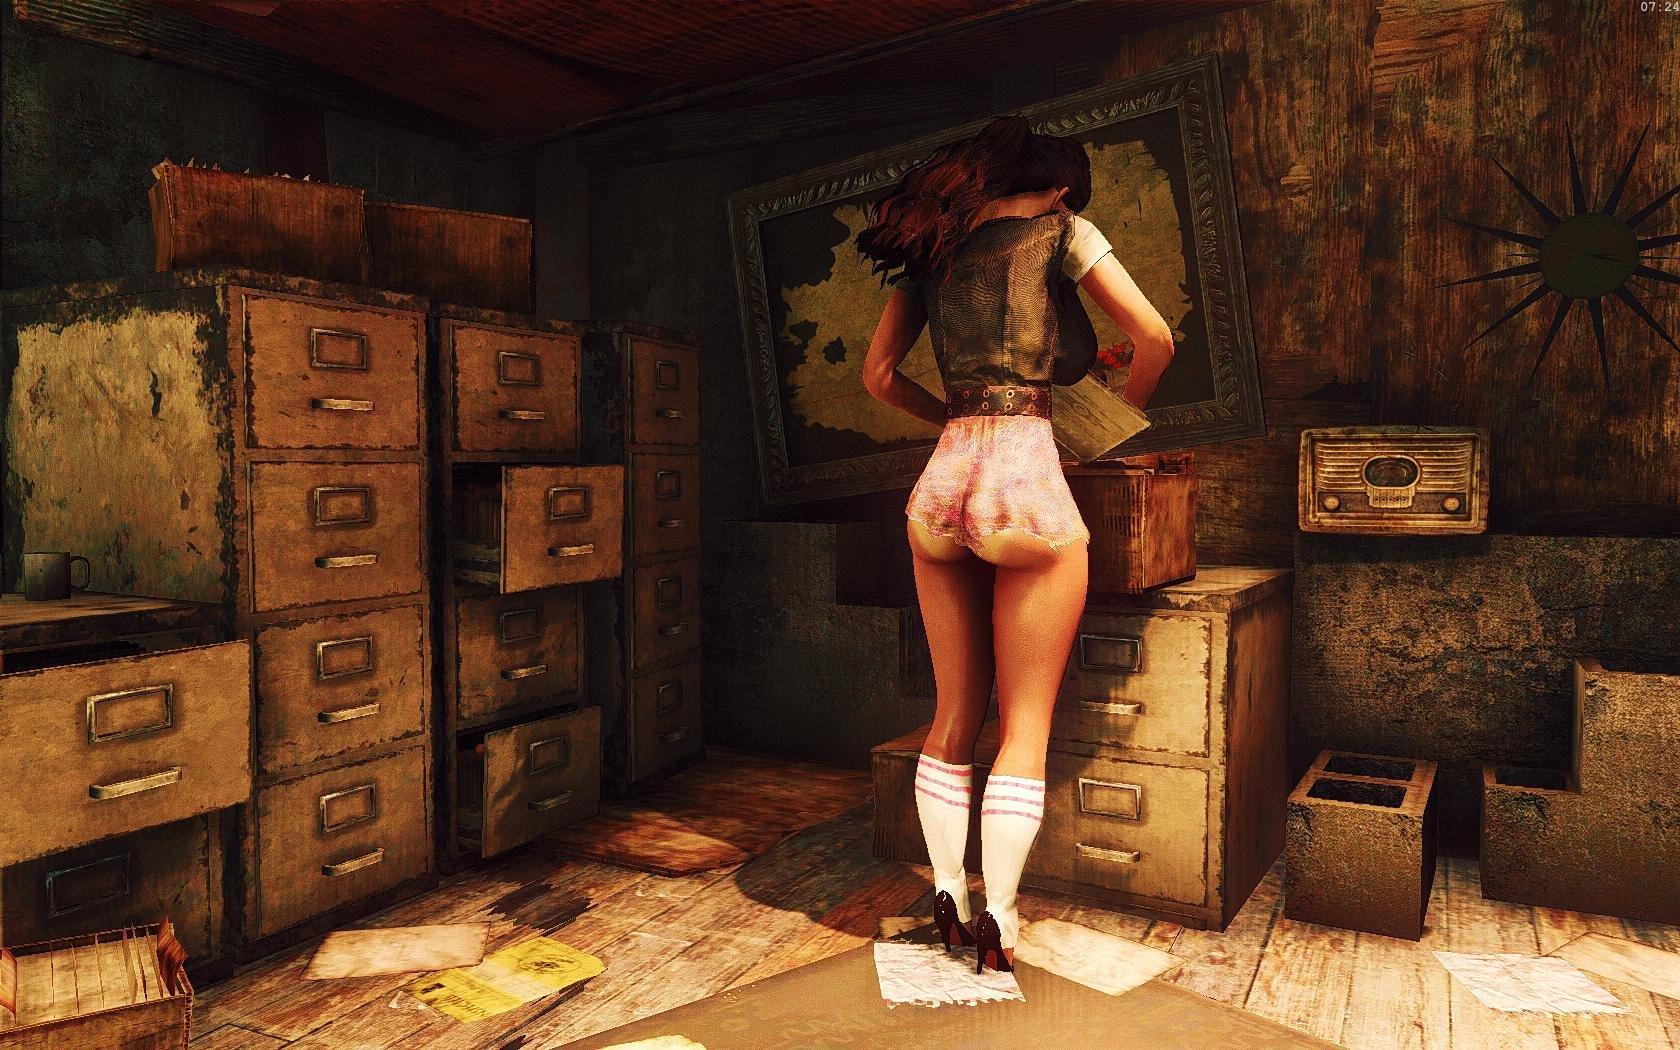 Fallout4 2019-02-08 07-24-34-14